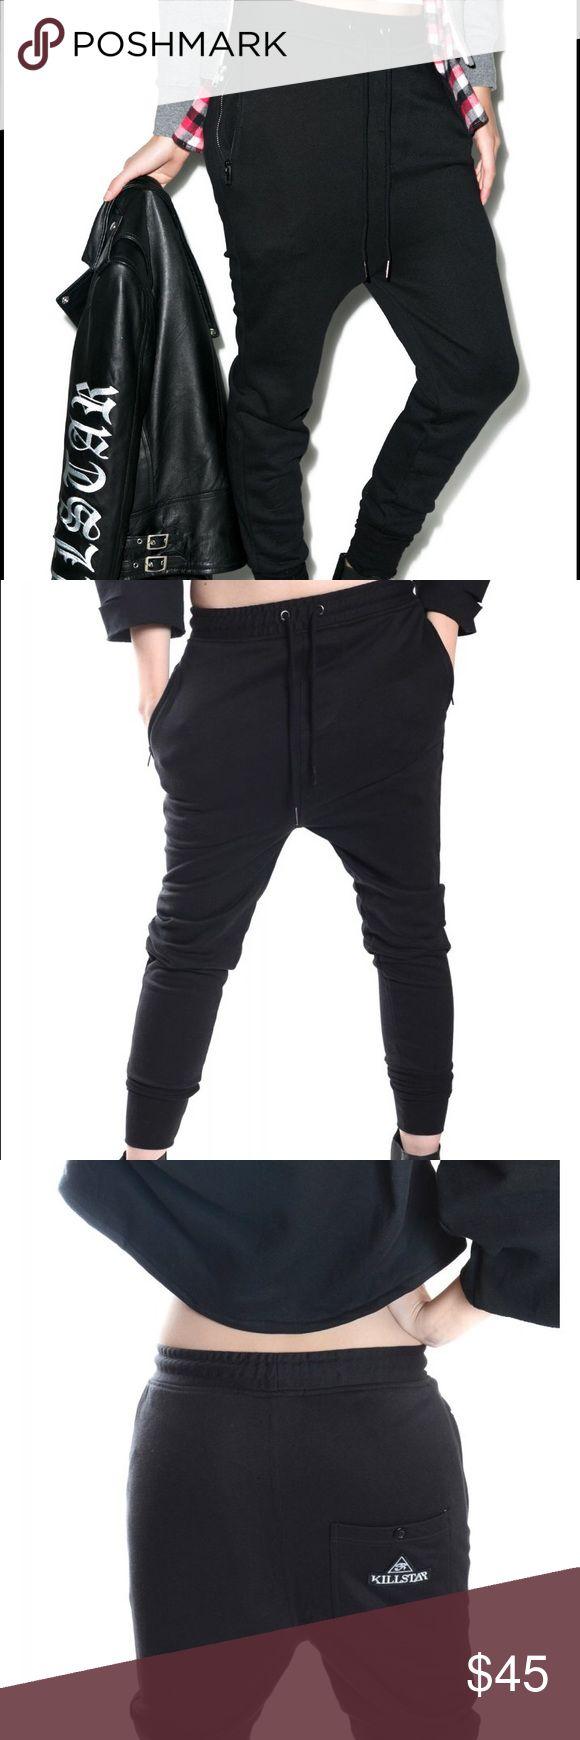 KILLSTAR FTW Dropcrotch Pants KILLSTAR FTW Dropcrotch pants. BRAND NEW WITH TAGS IN ORIGINAL PACKAGING. SIZE SMALL. UNISEX. suuuper comfy. KILLSTAR Pants Track Pants & Joggers